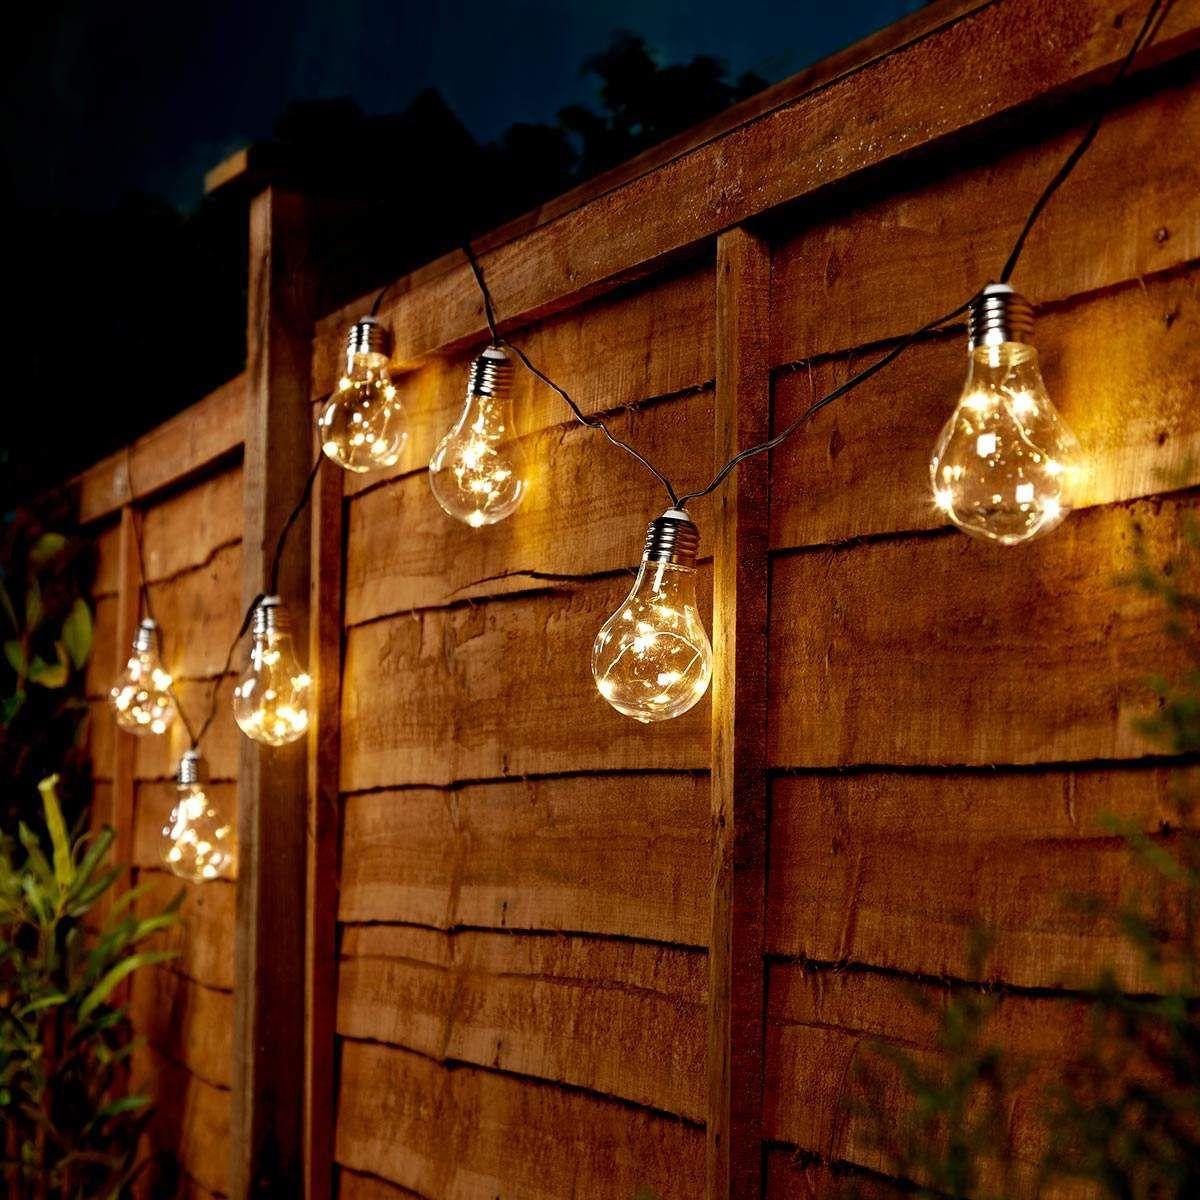 New 10 Solar Led Bulb String Lights Outdoor Hanging Fairy Bright White Garden